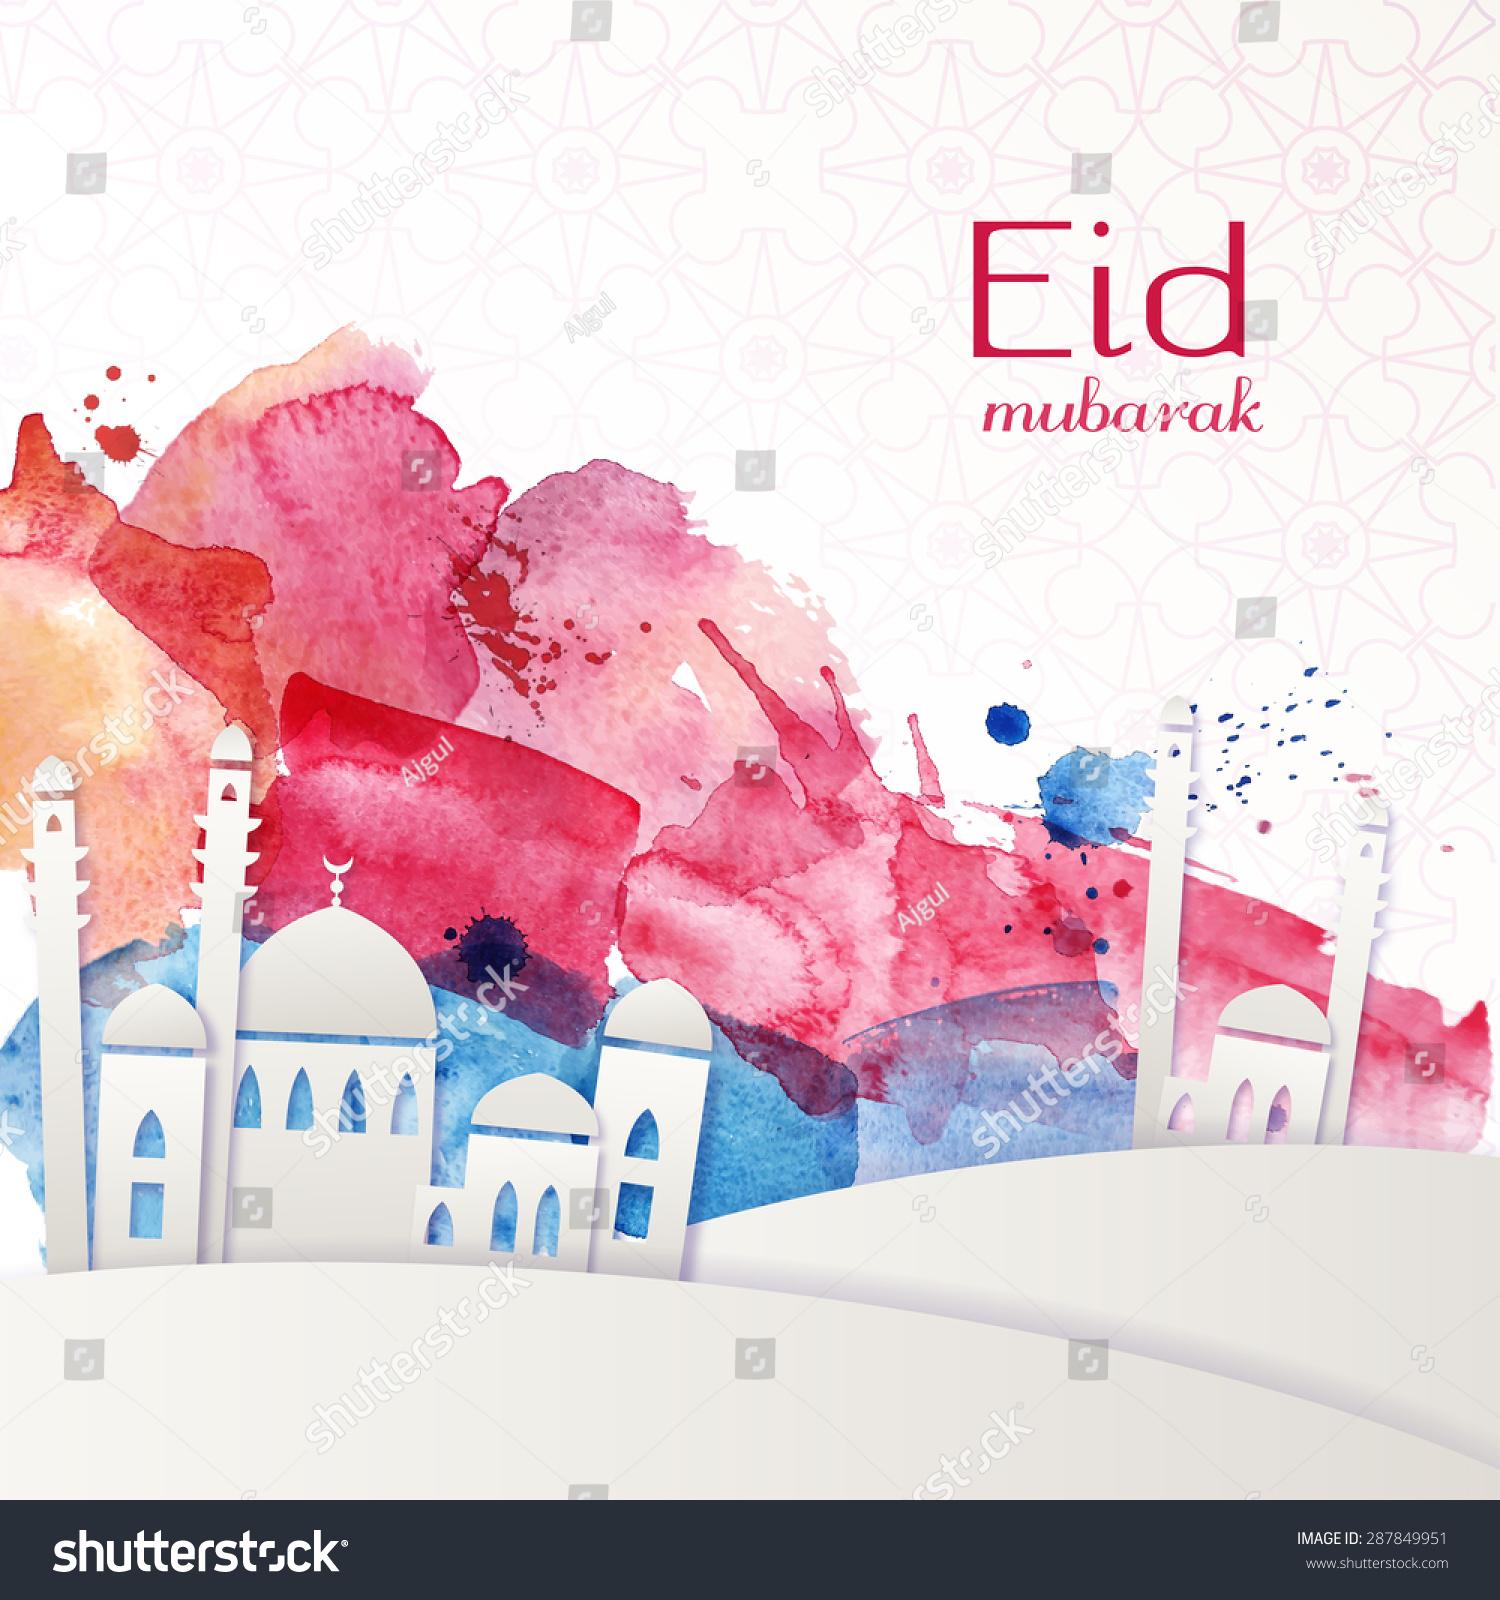 Eid Mubarak Traditional Muslim Greeting Muslim Stock Vector Royalty